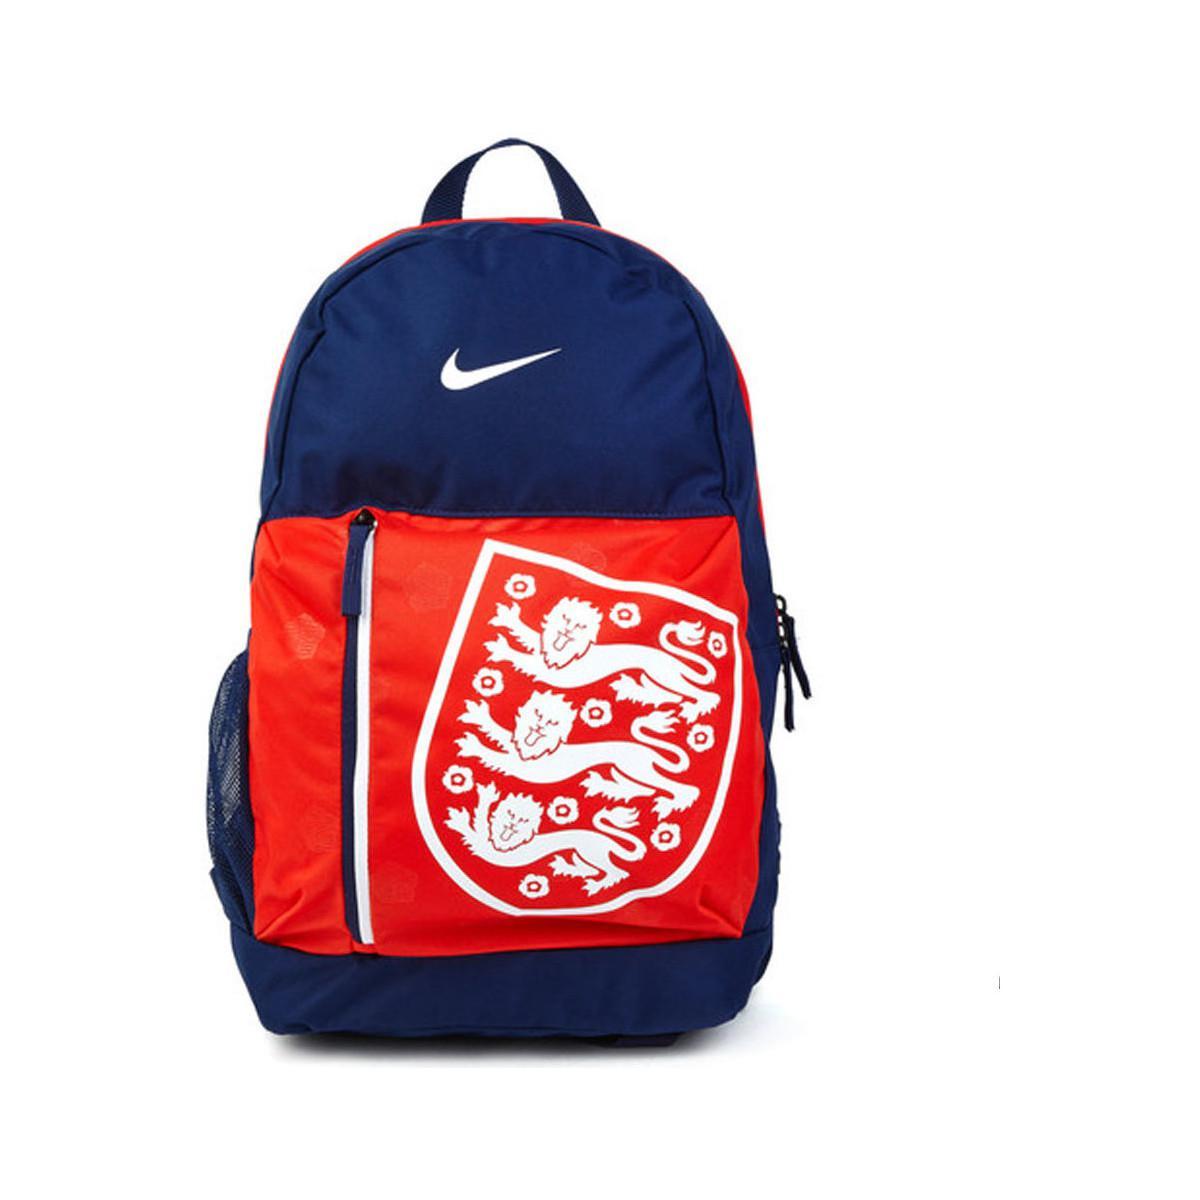 e9427c58f9f0 Nike 2018-2019 England Stadiumpack Men s Backpack In Blue in Blue ...